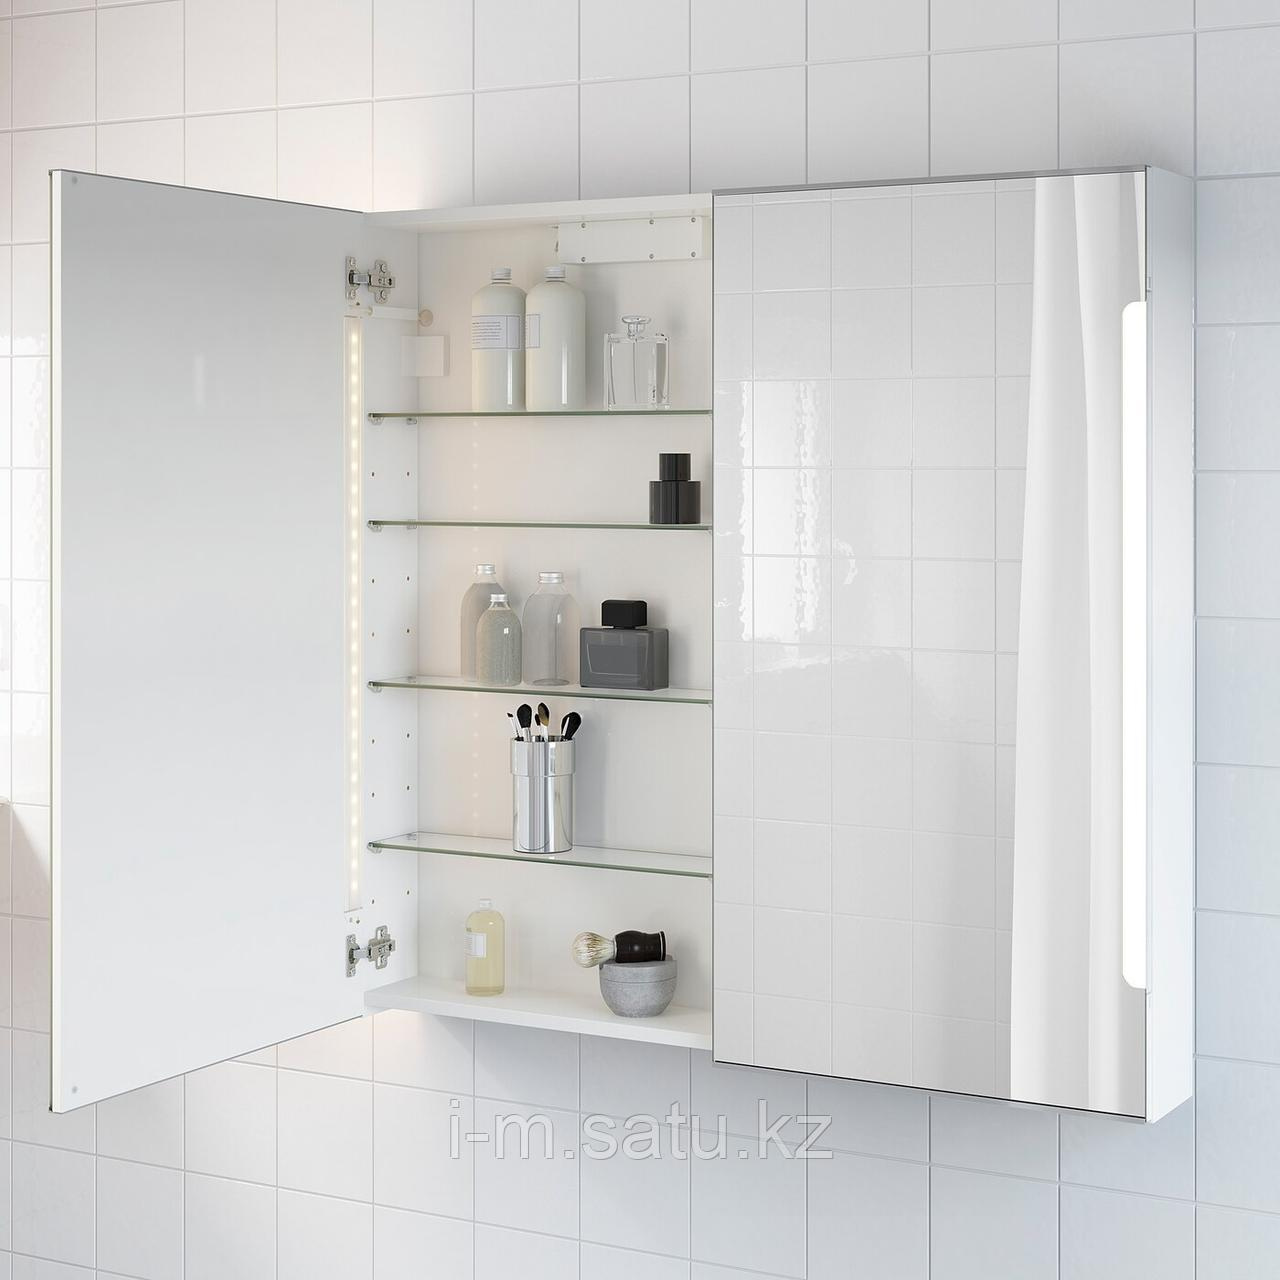 СТОРЙОРМ Зеркальн шкафчик/2дверцы/подсветка, белый, белый 100x14x96 см